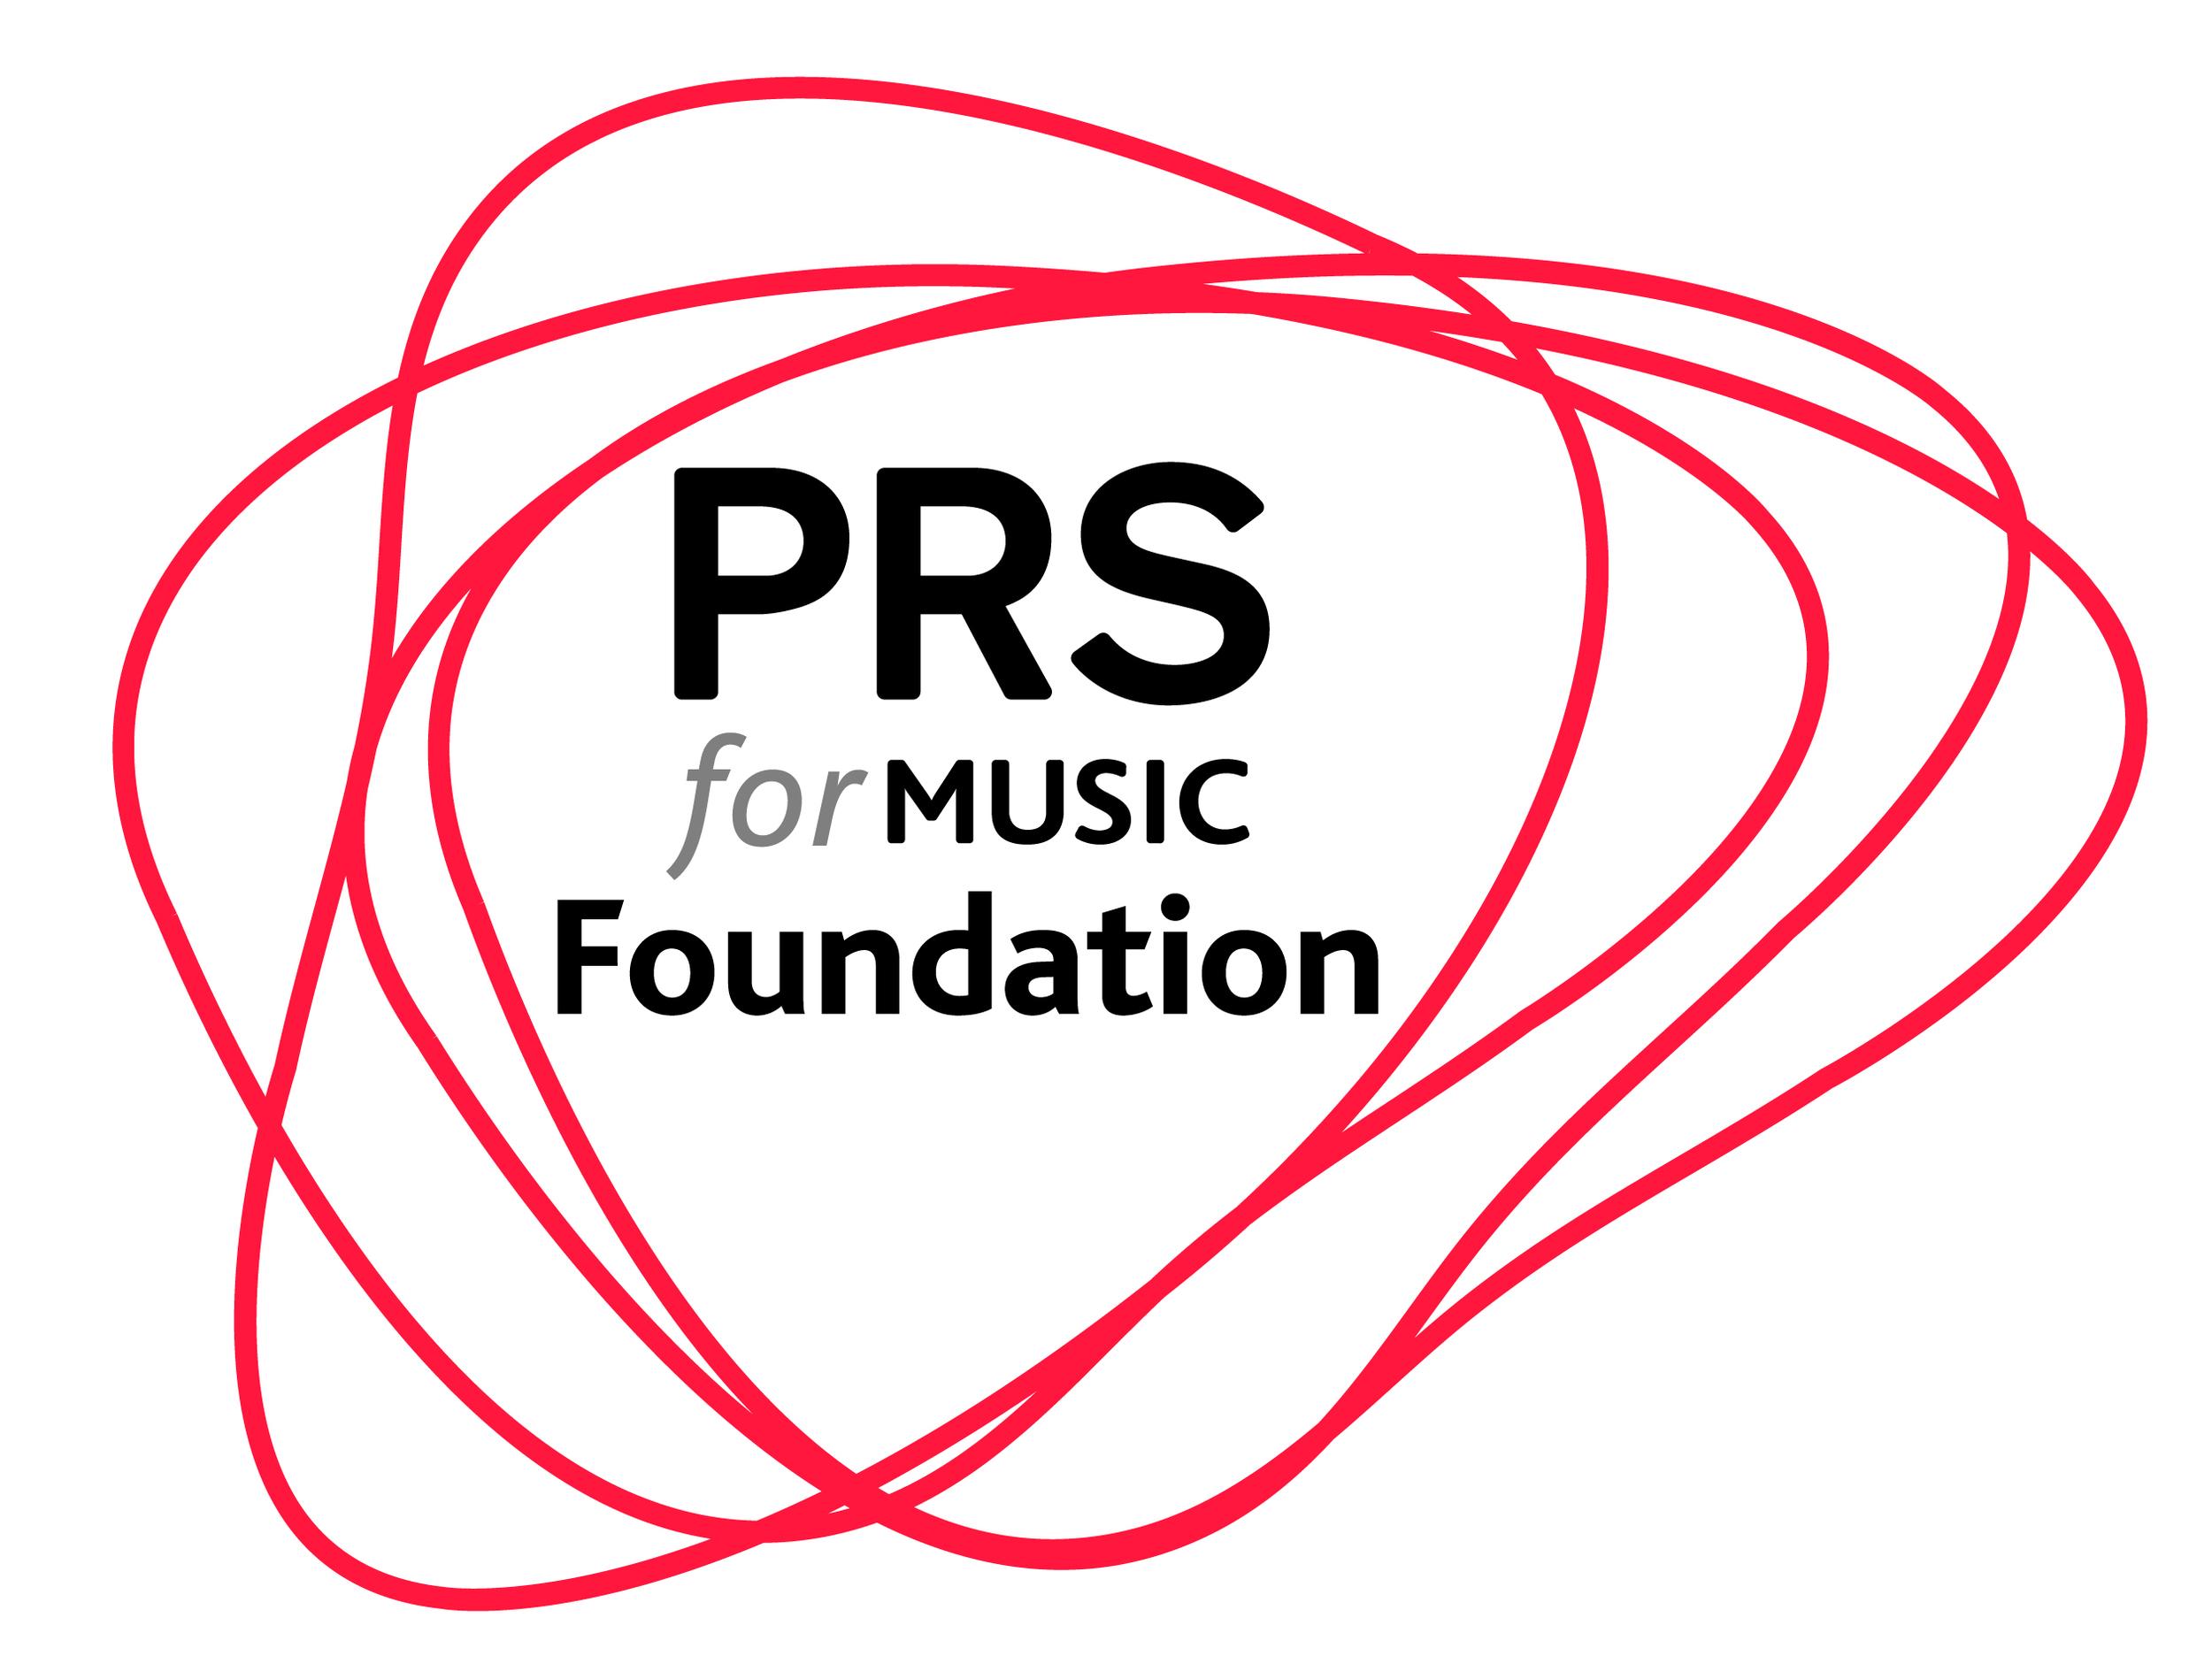 PRSF-logo-High-Res.jpg